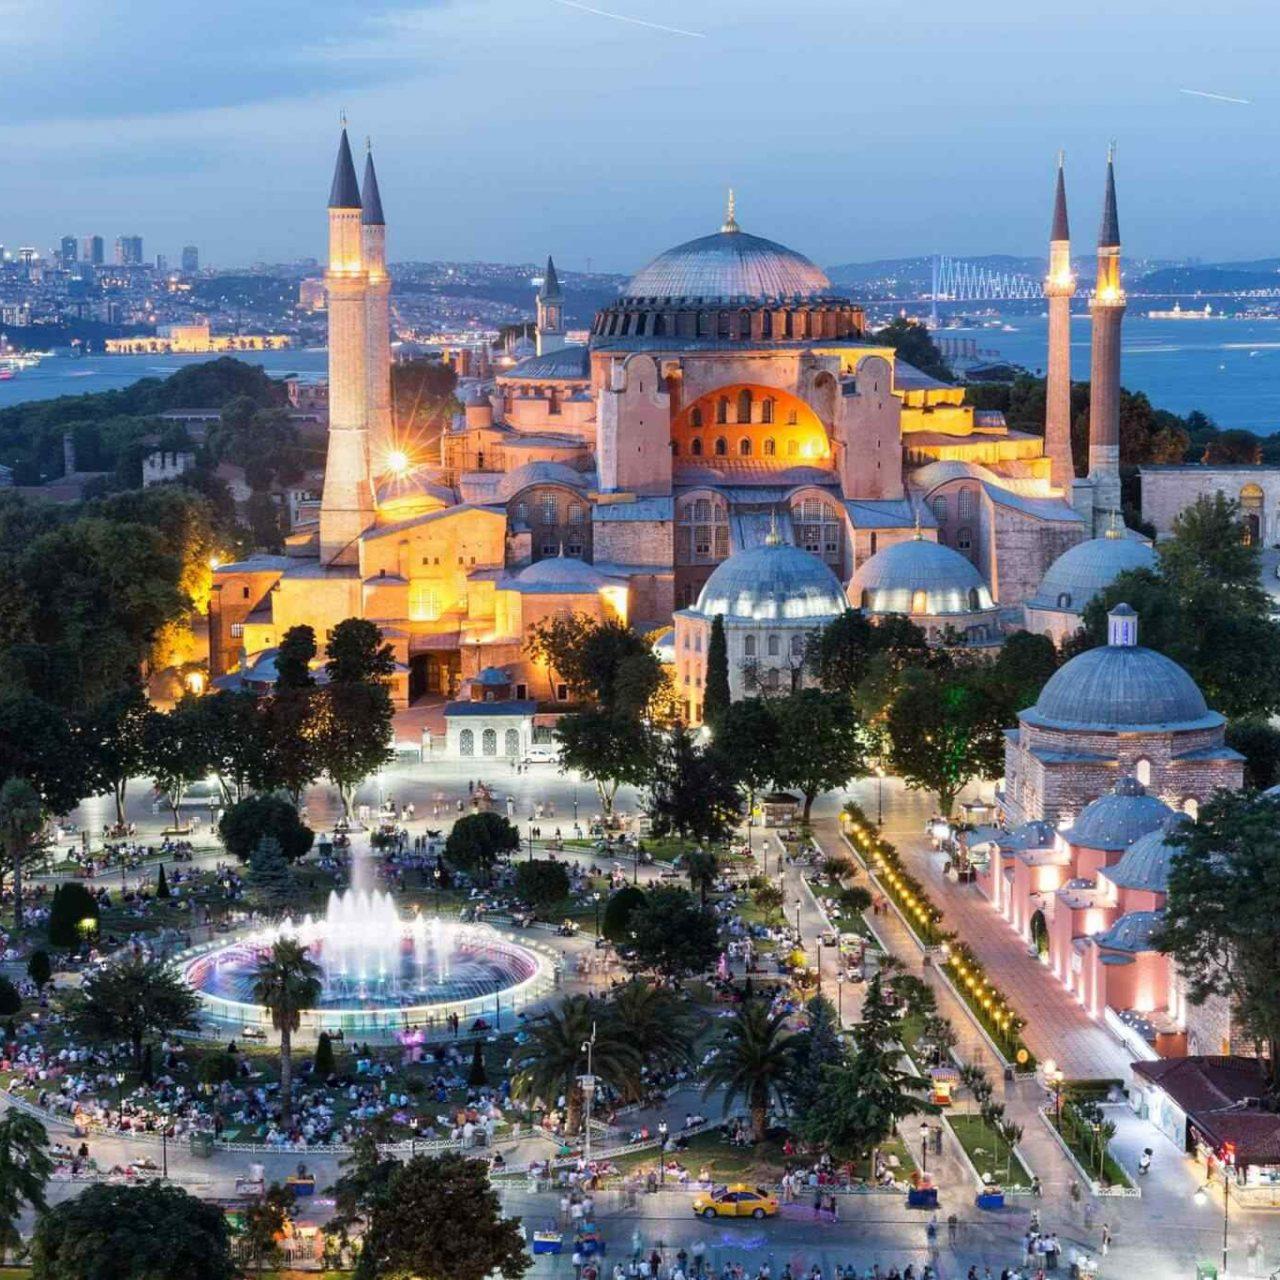 https://www.tembeta.cl/wp-content/uploads/2018/09/destination-istanbul-02-1280x1280.jpg